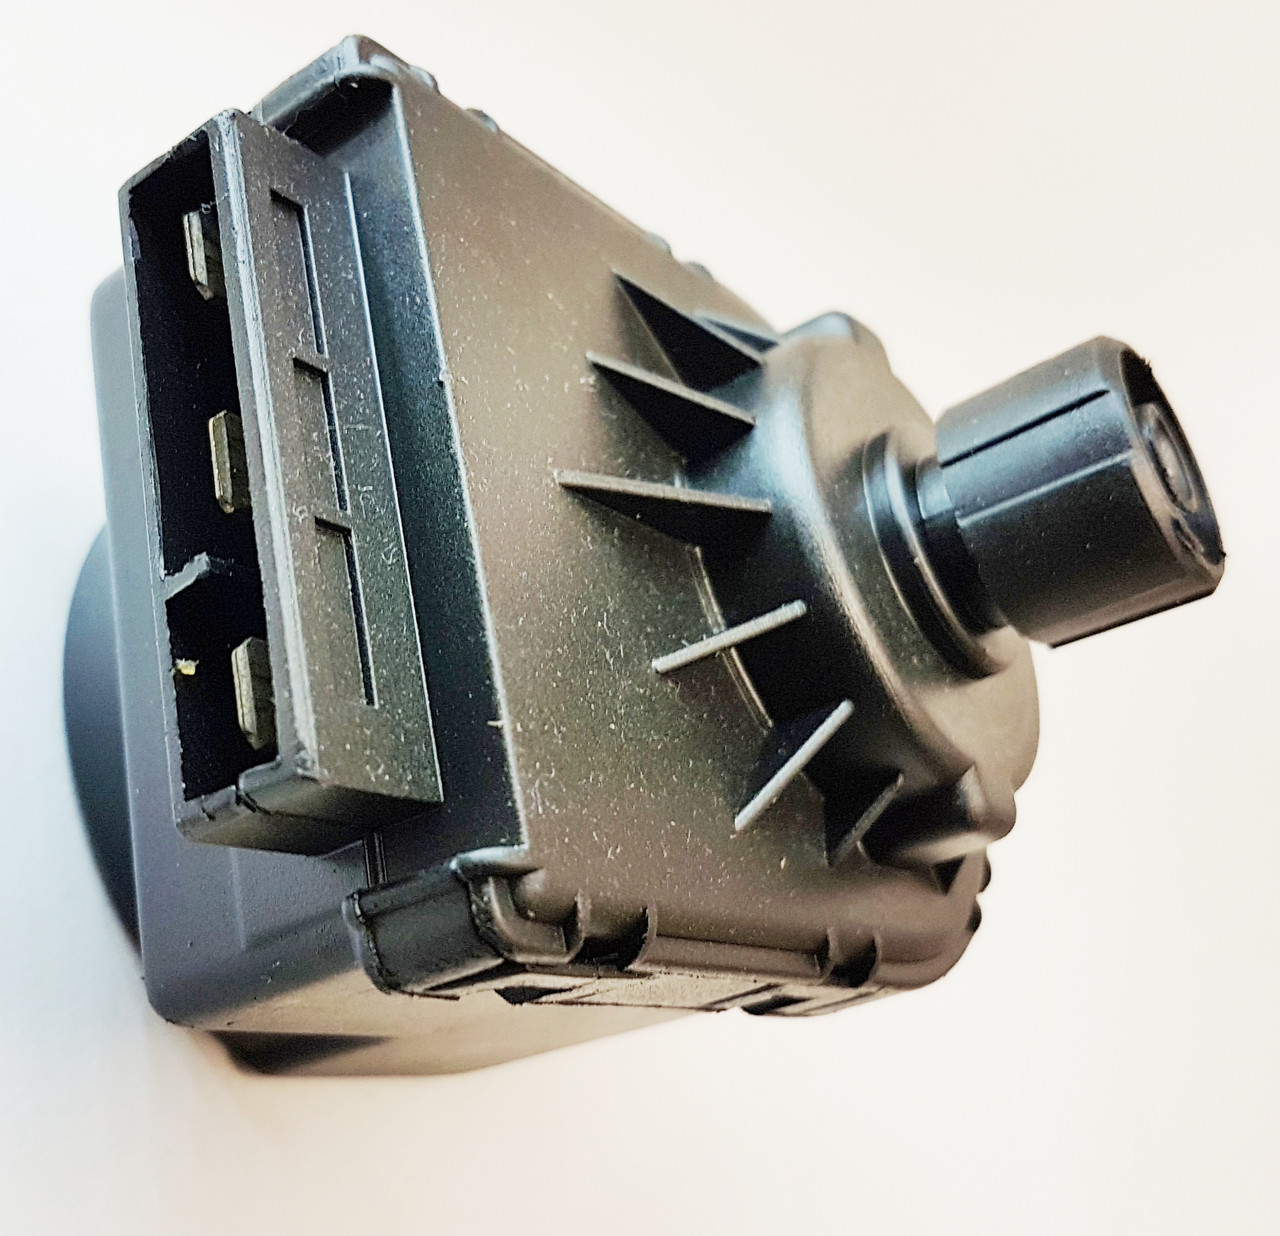 997147 Электропривод  трехходового клапана для Baxi, Ariston, Sime, Immergas, Hermann, Demrad. DO057